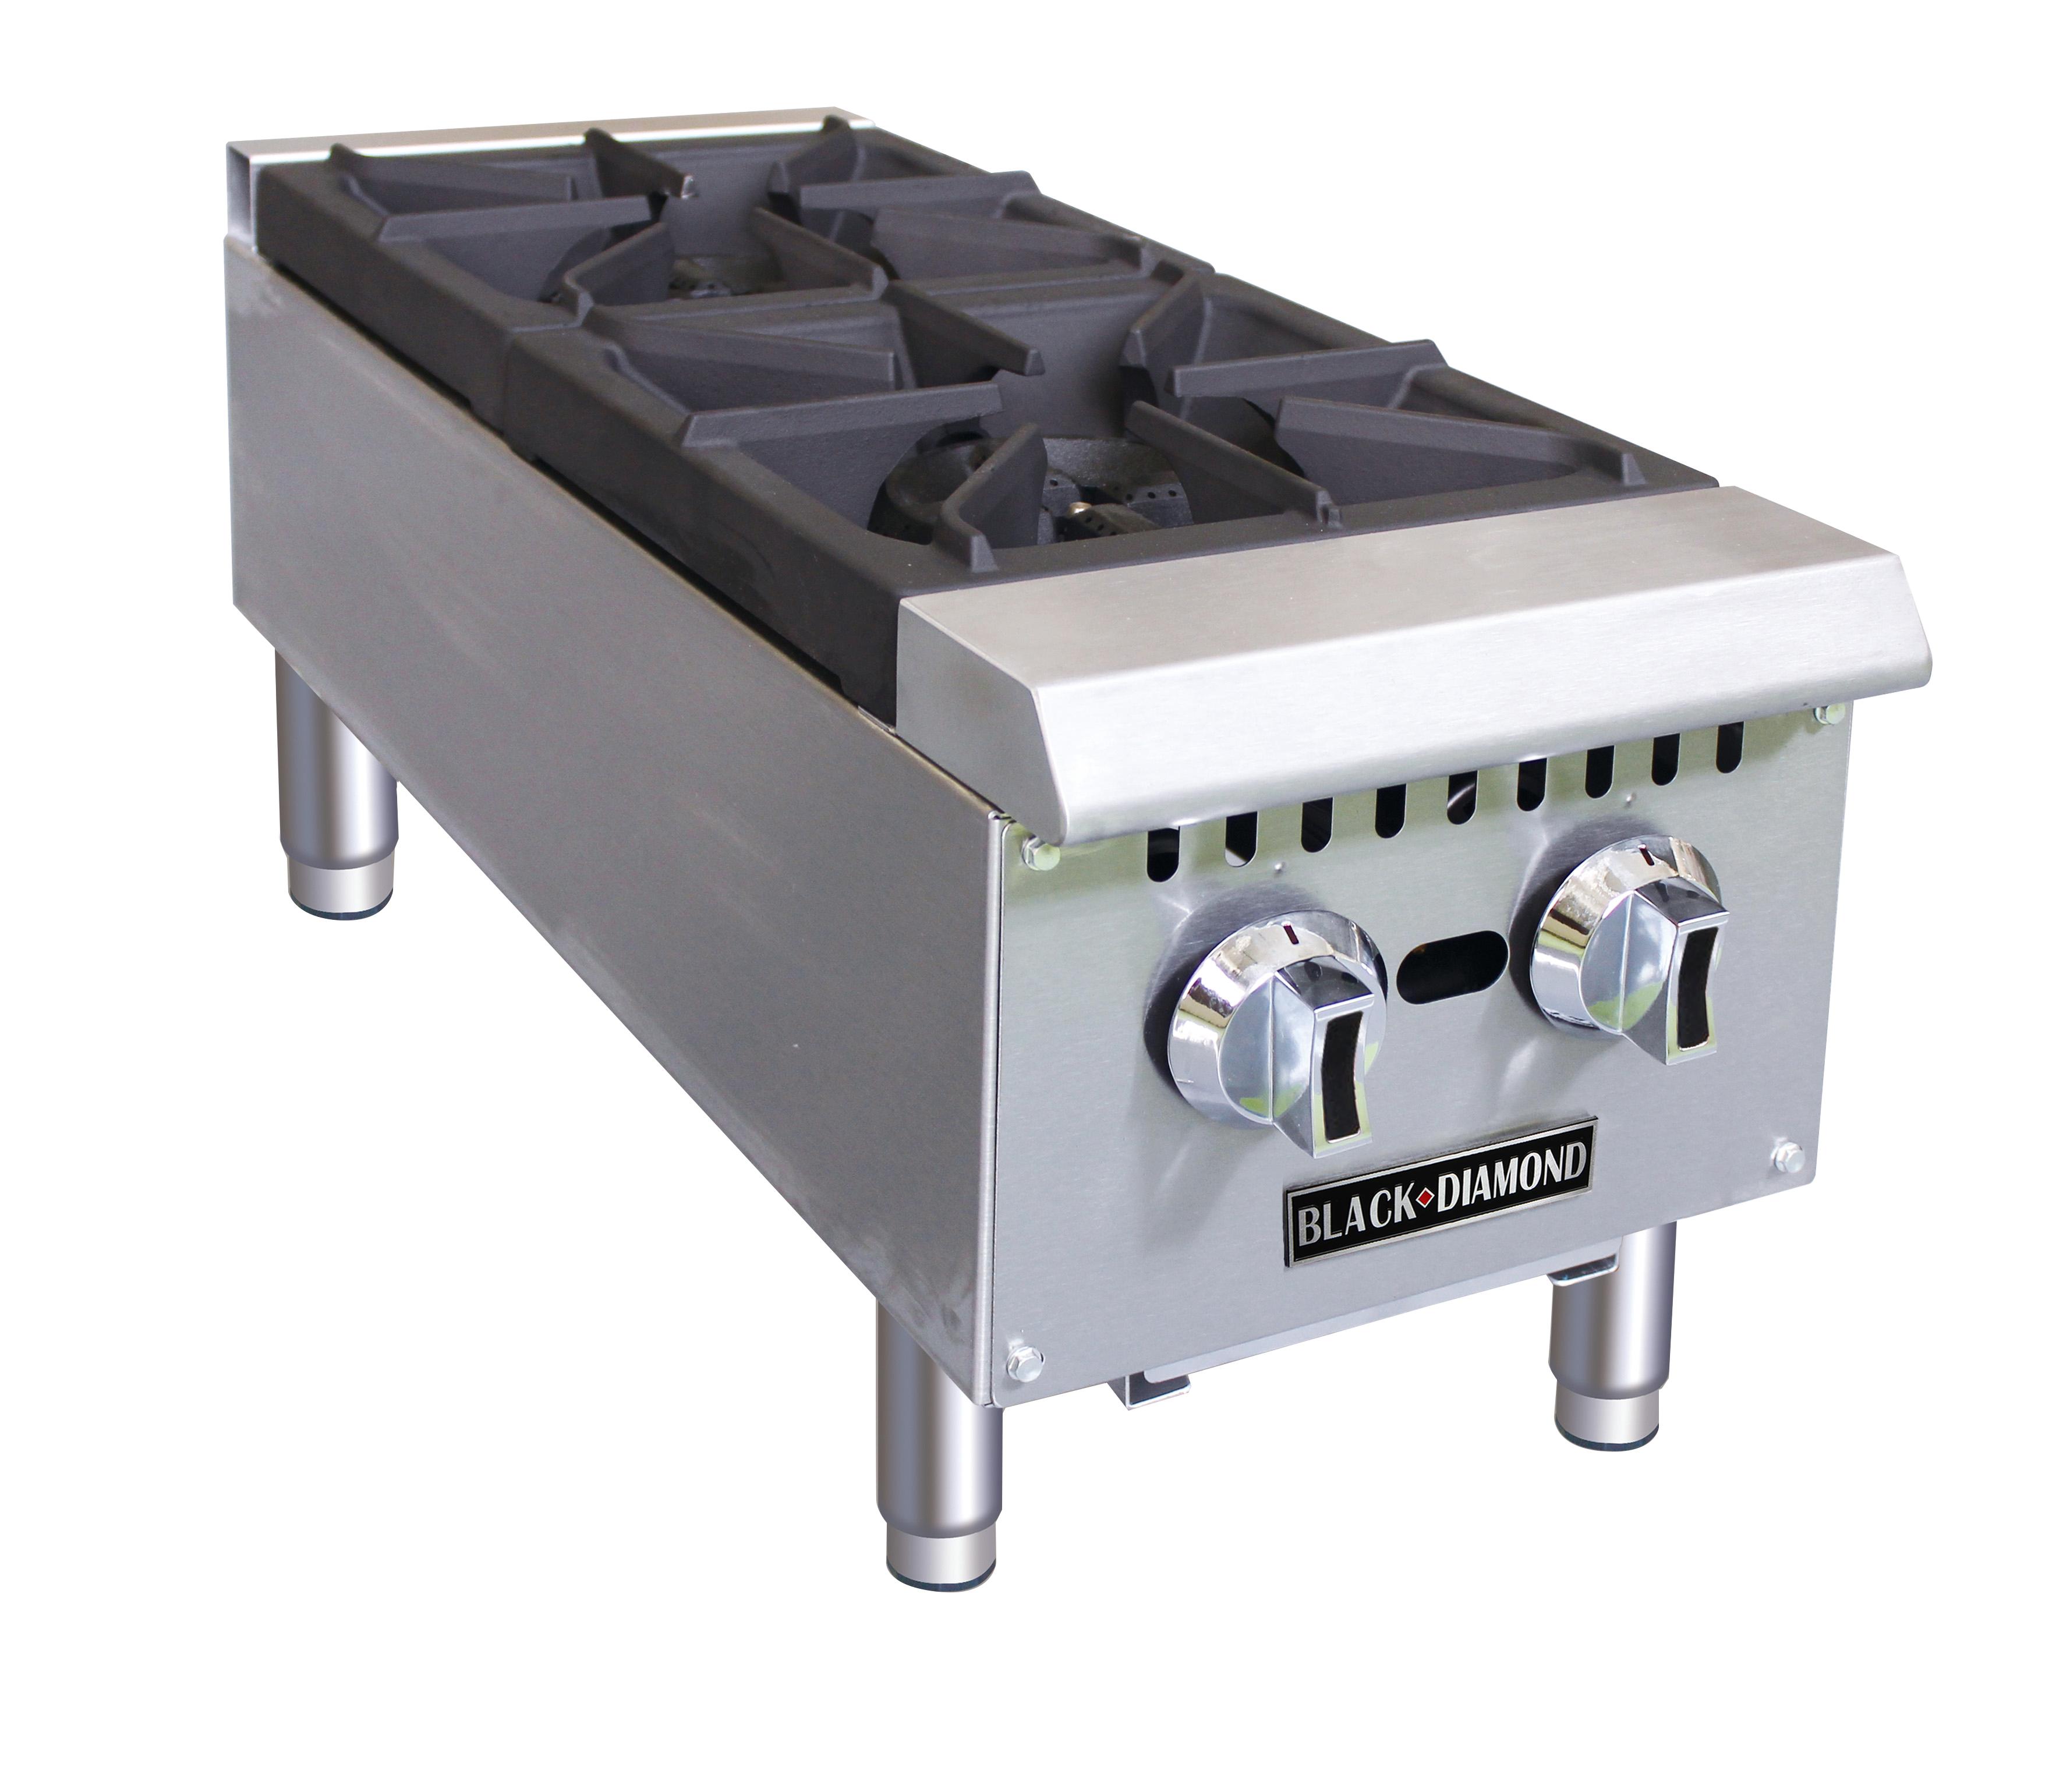 Adcraft (Admiral Craft Equipment) BDCTH-12 gas hotplate